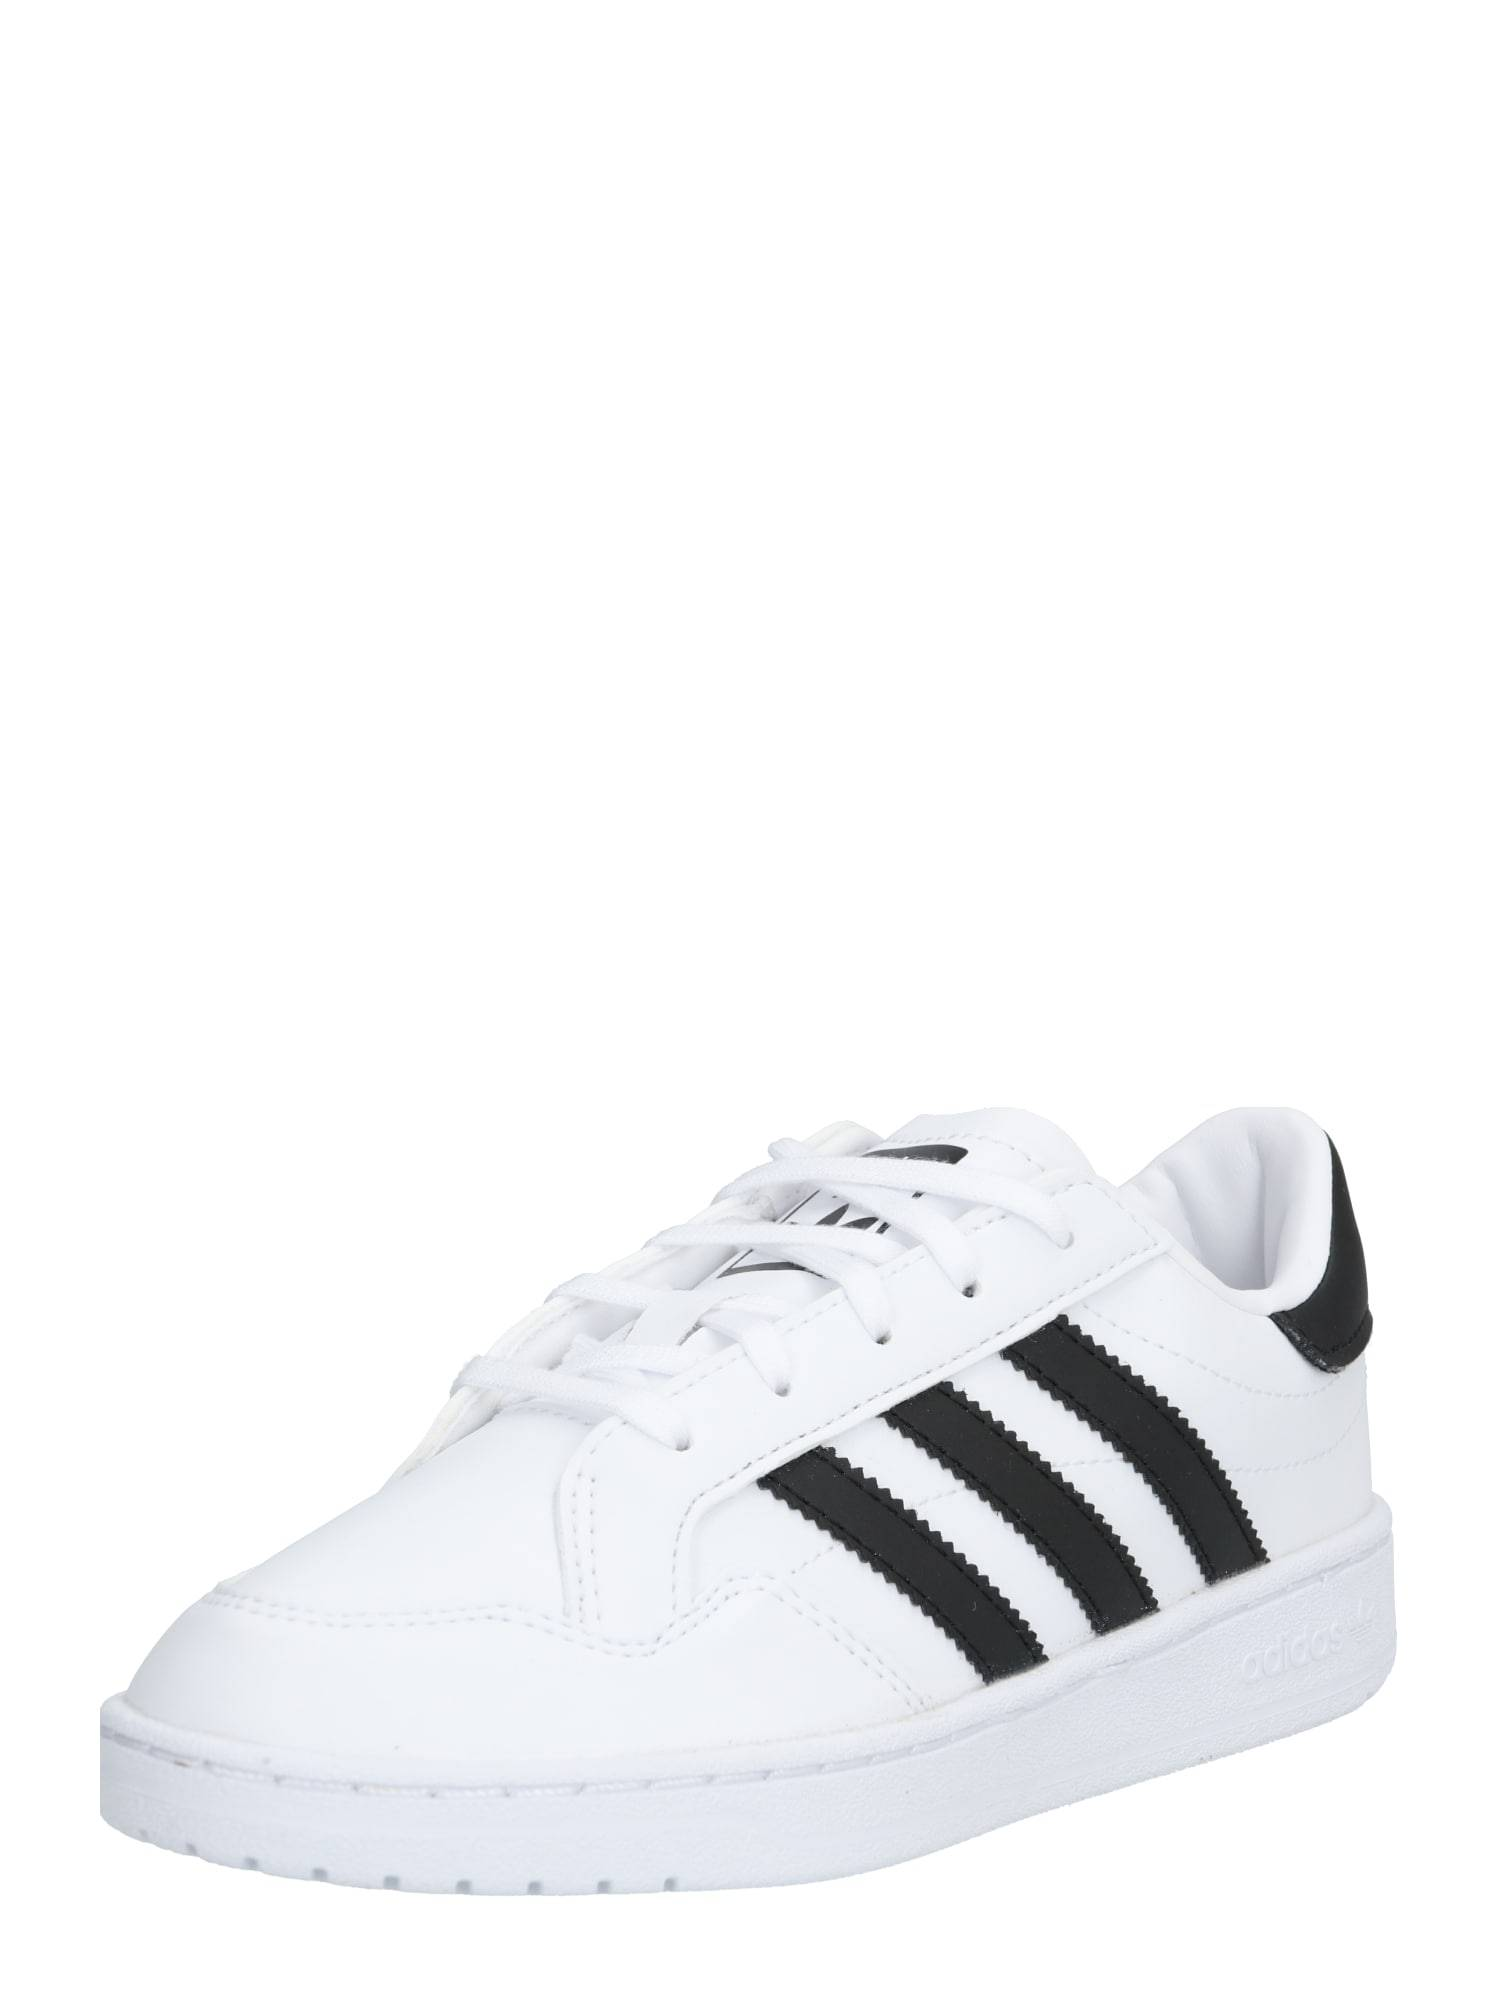 ADIDAS ORIGINALS Sneaker 'TEAM COURT' Bianco